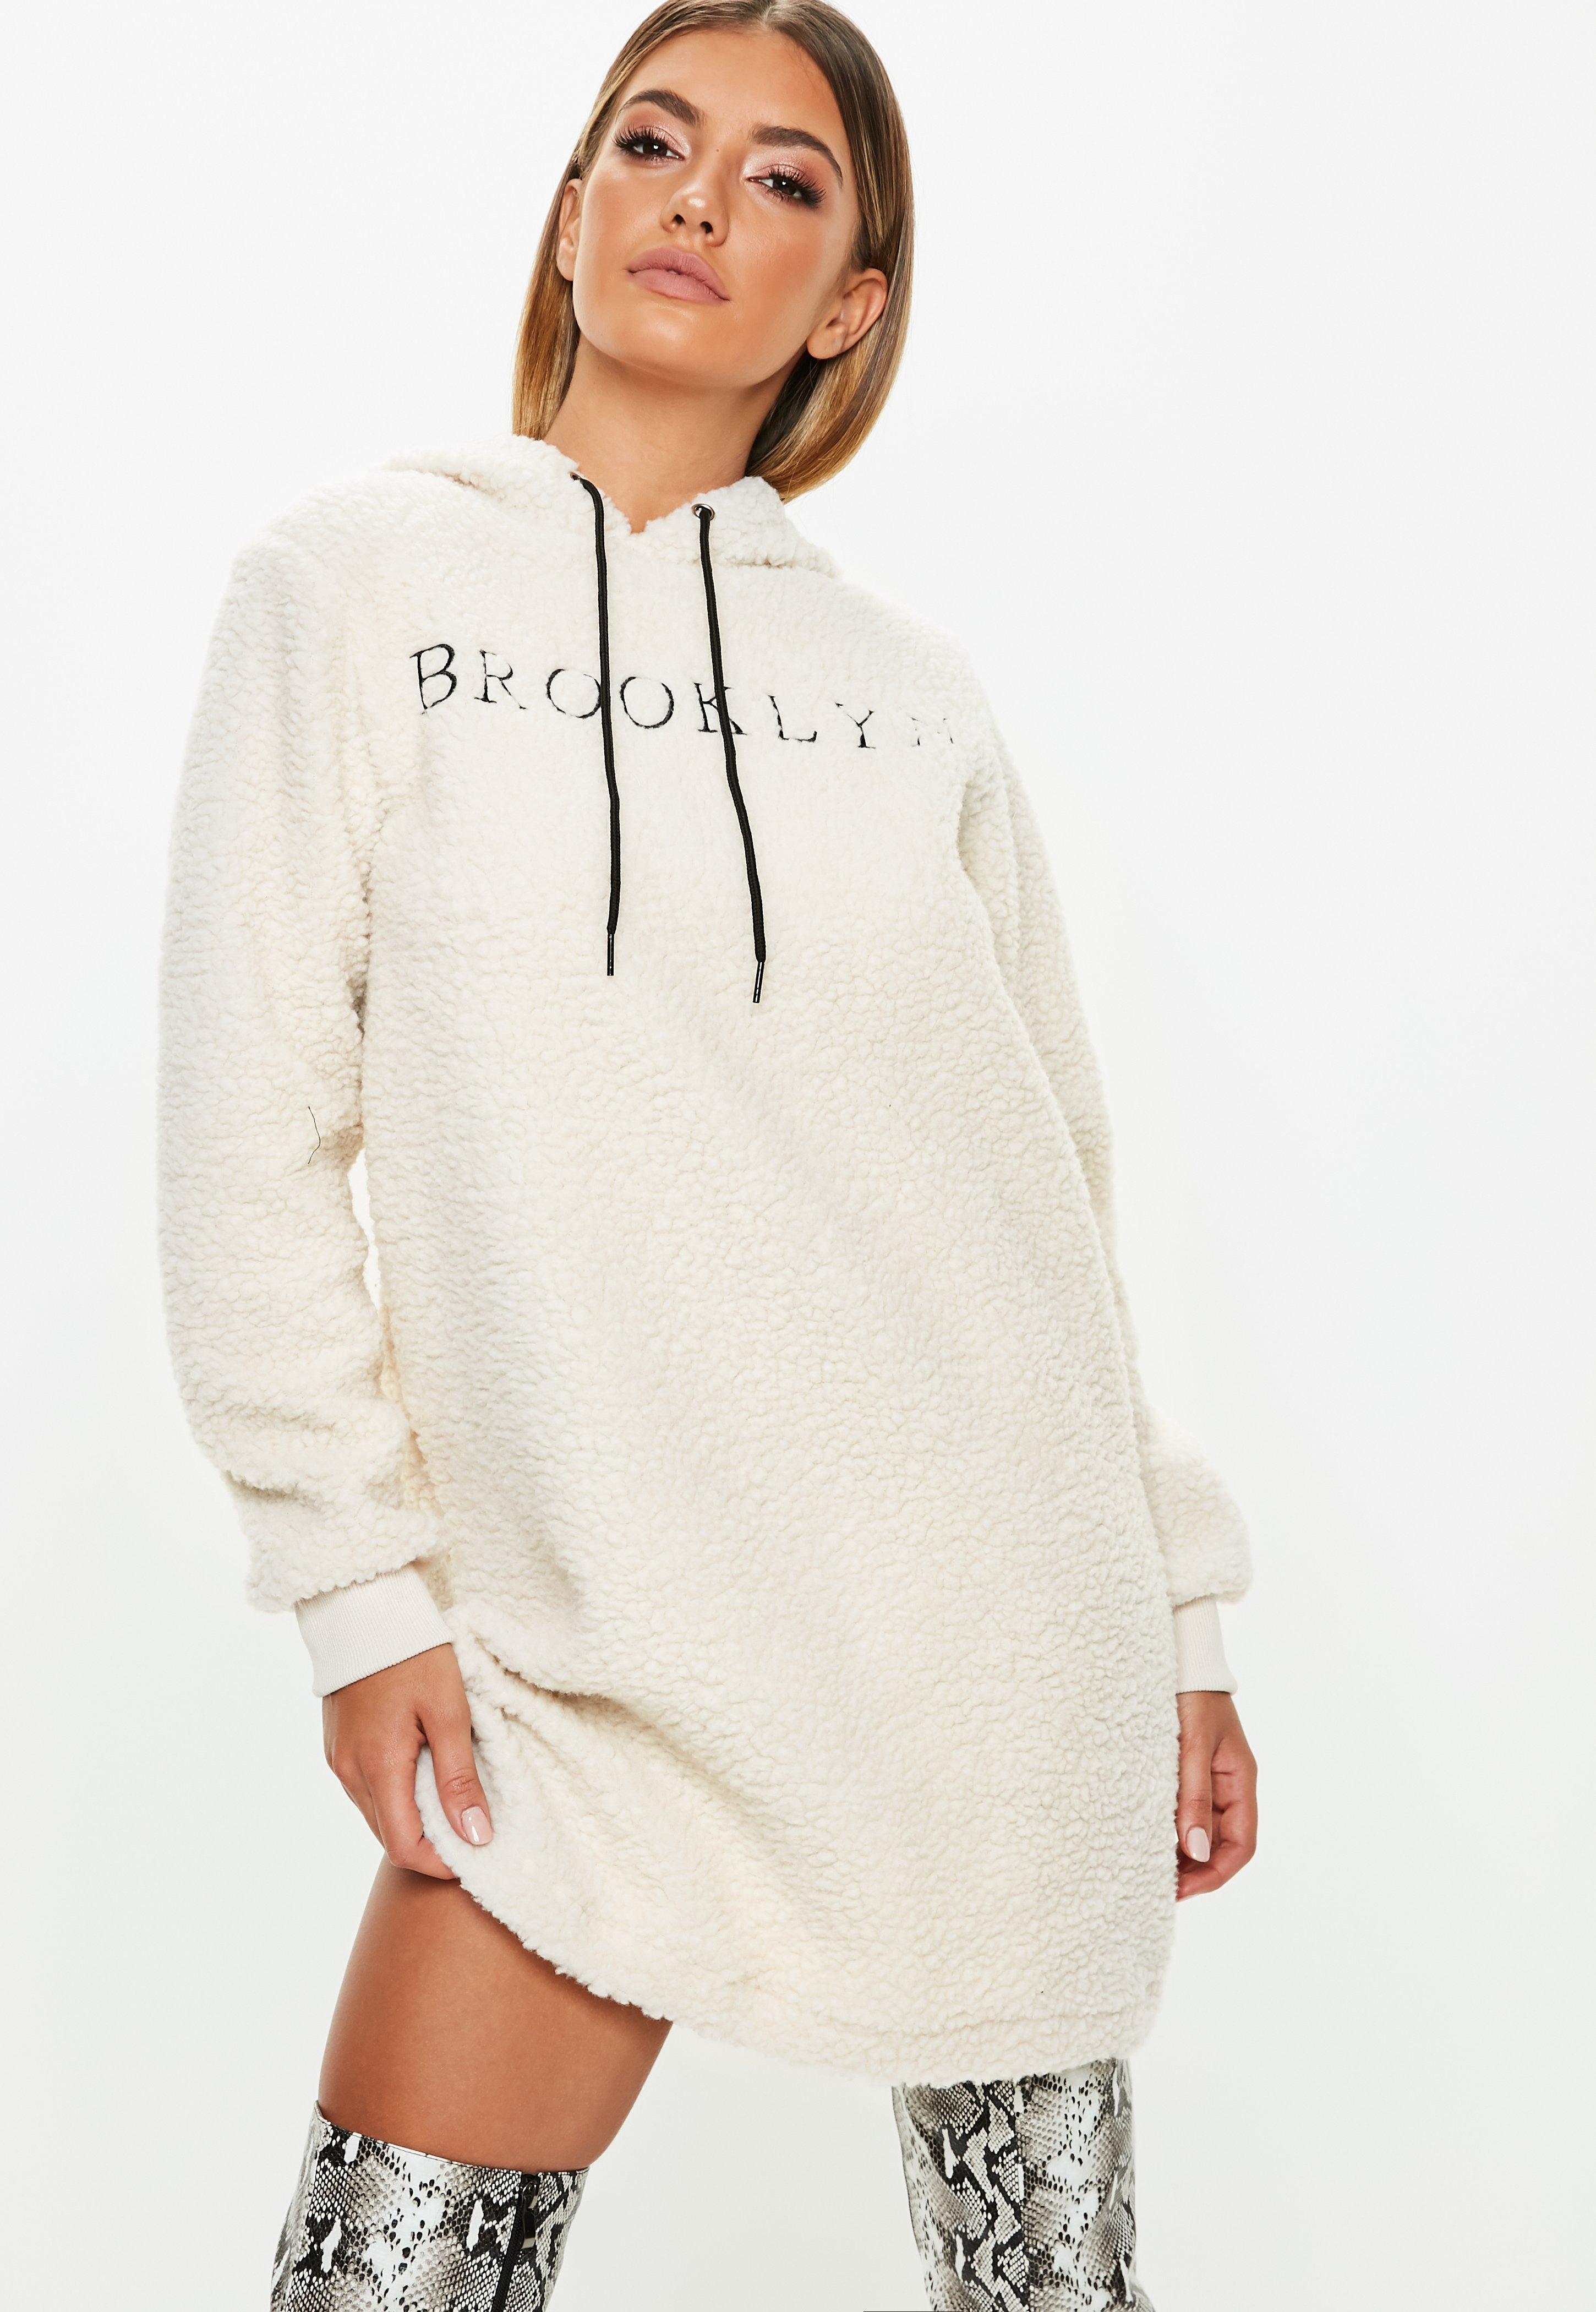 a109535705b Cream Borg Brooklyn Slogan Sweater Dress